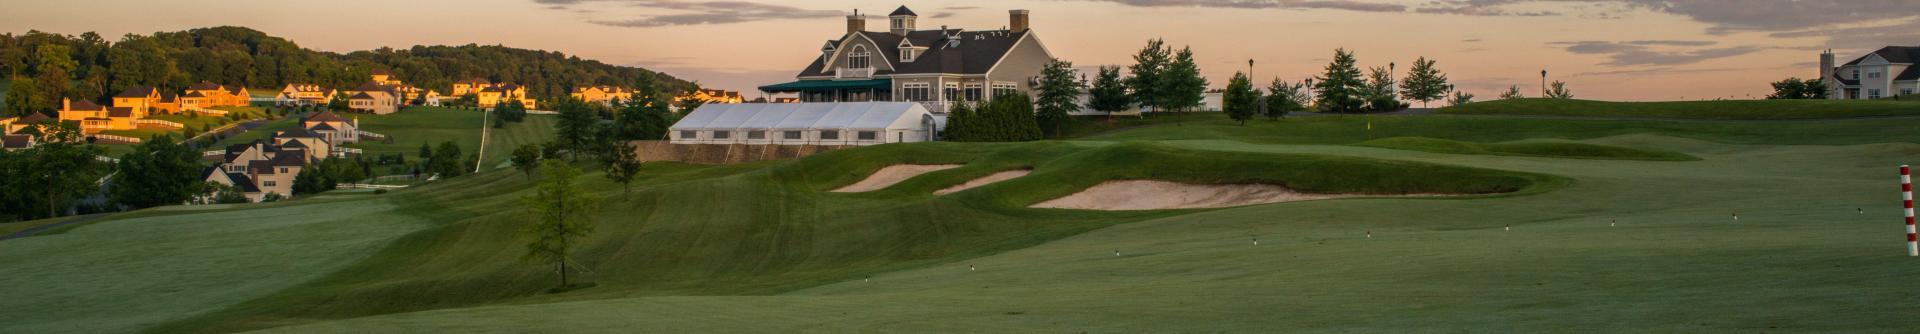 Morgan Hill Golf Course in Easton, PA